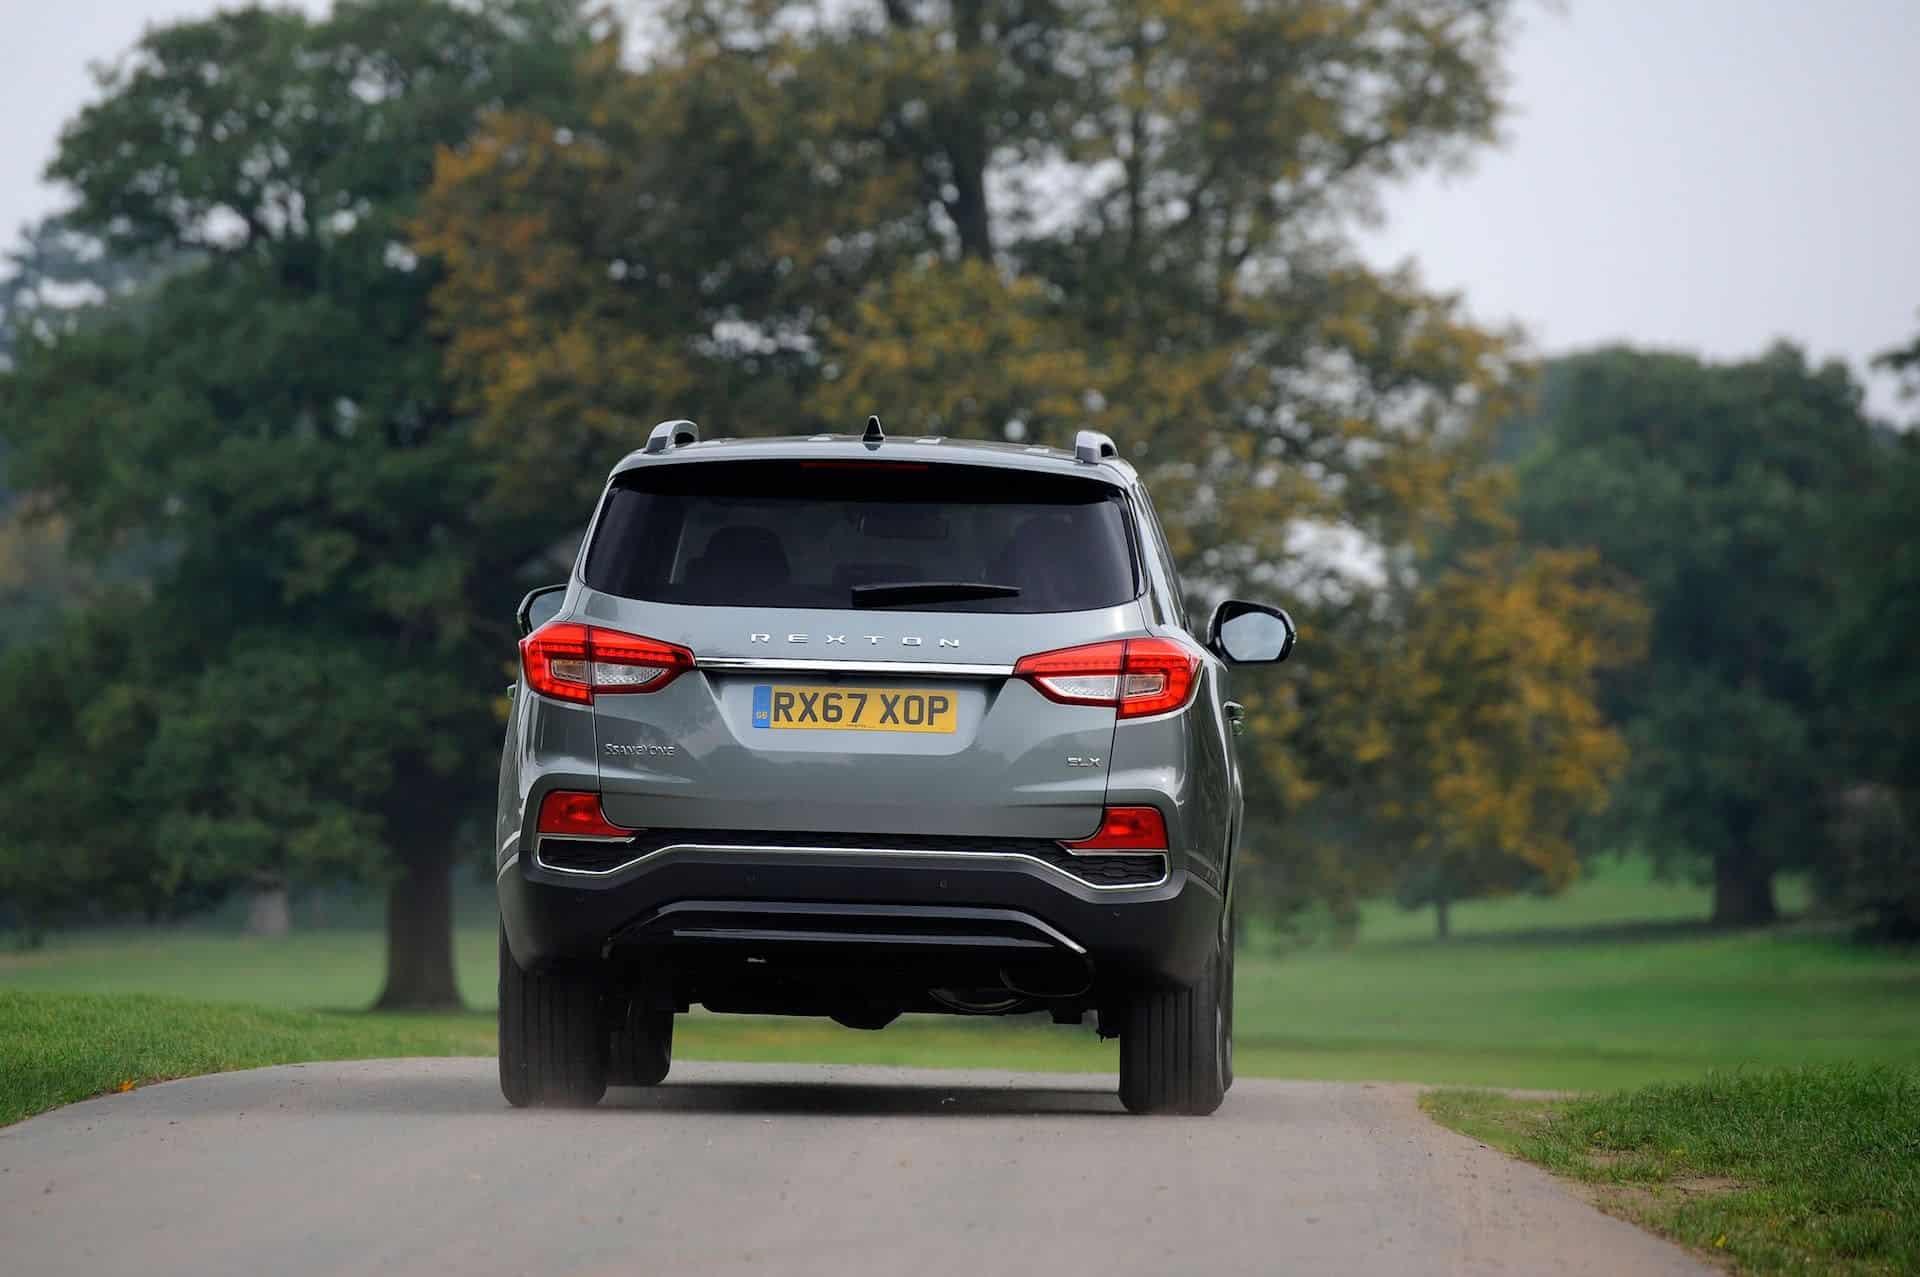 SsangYong Rexton rear view | The Car Expert review 2017